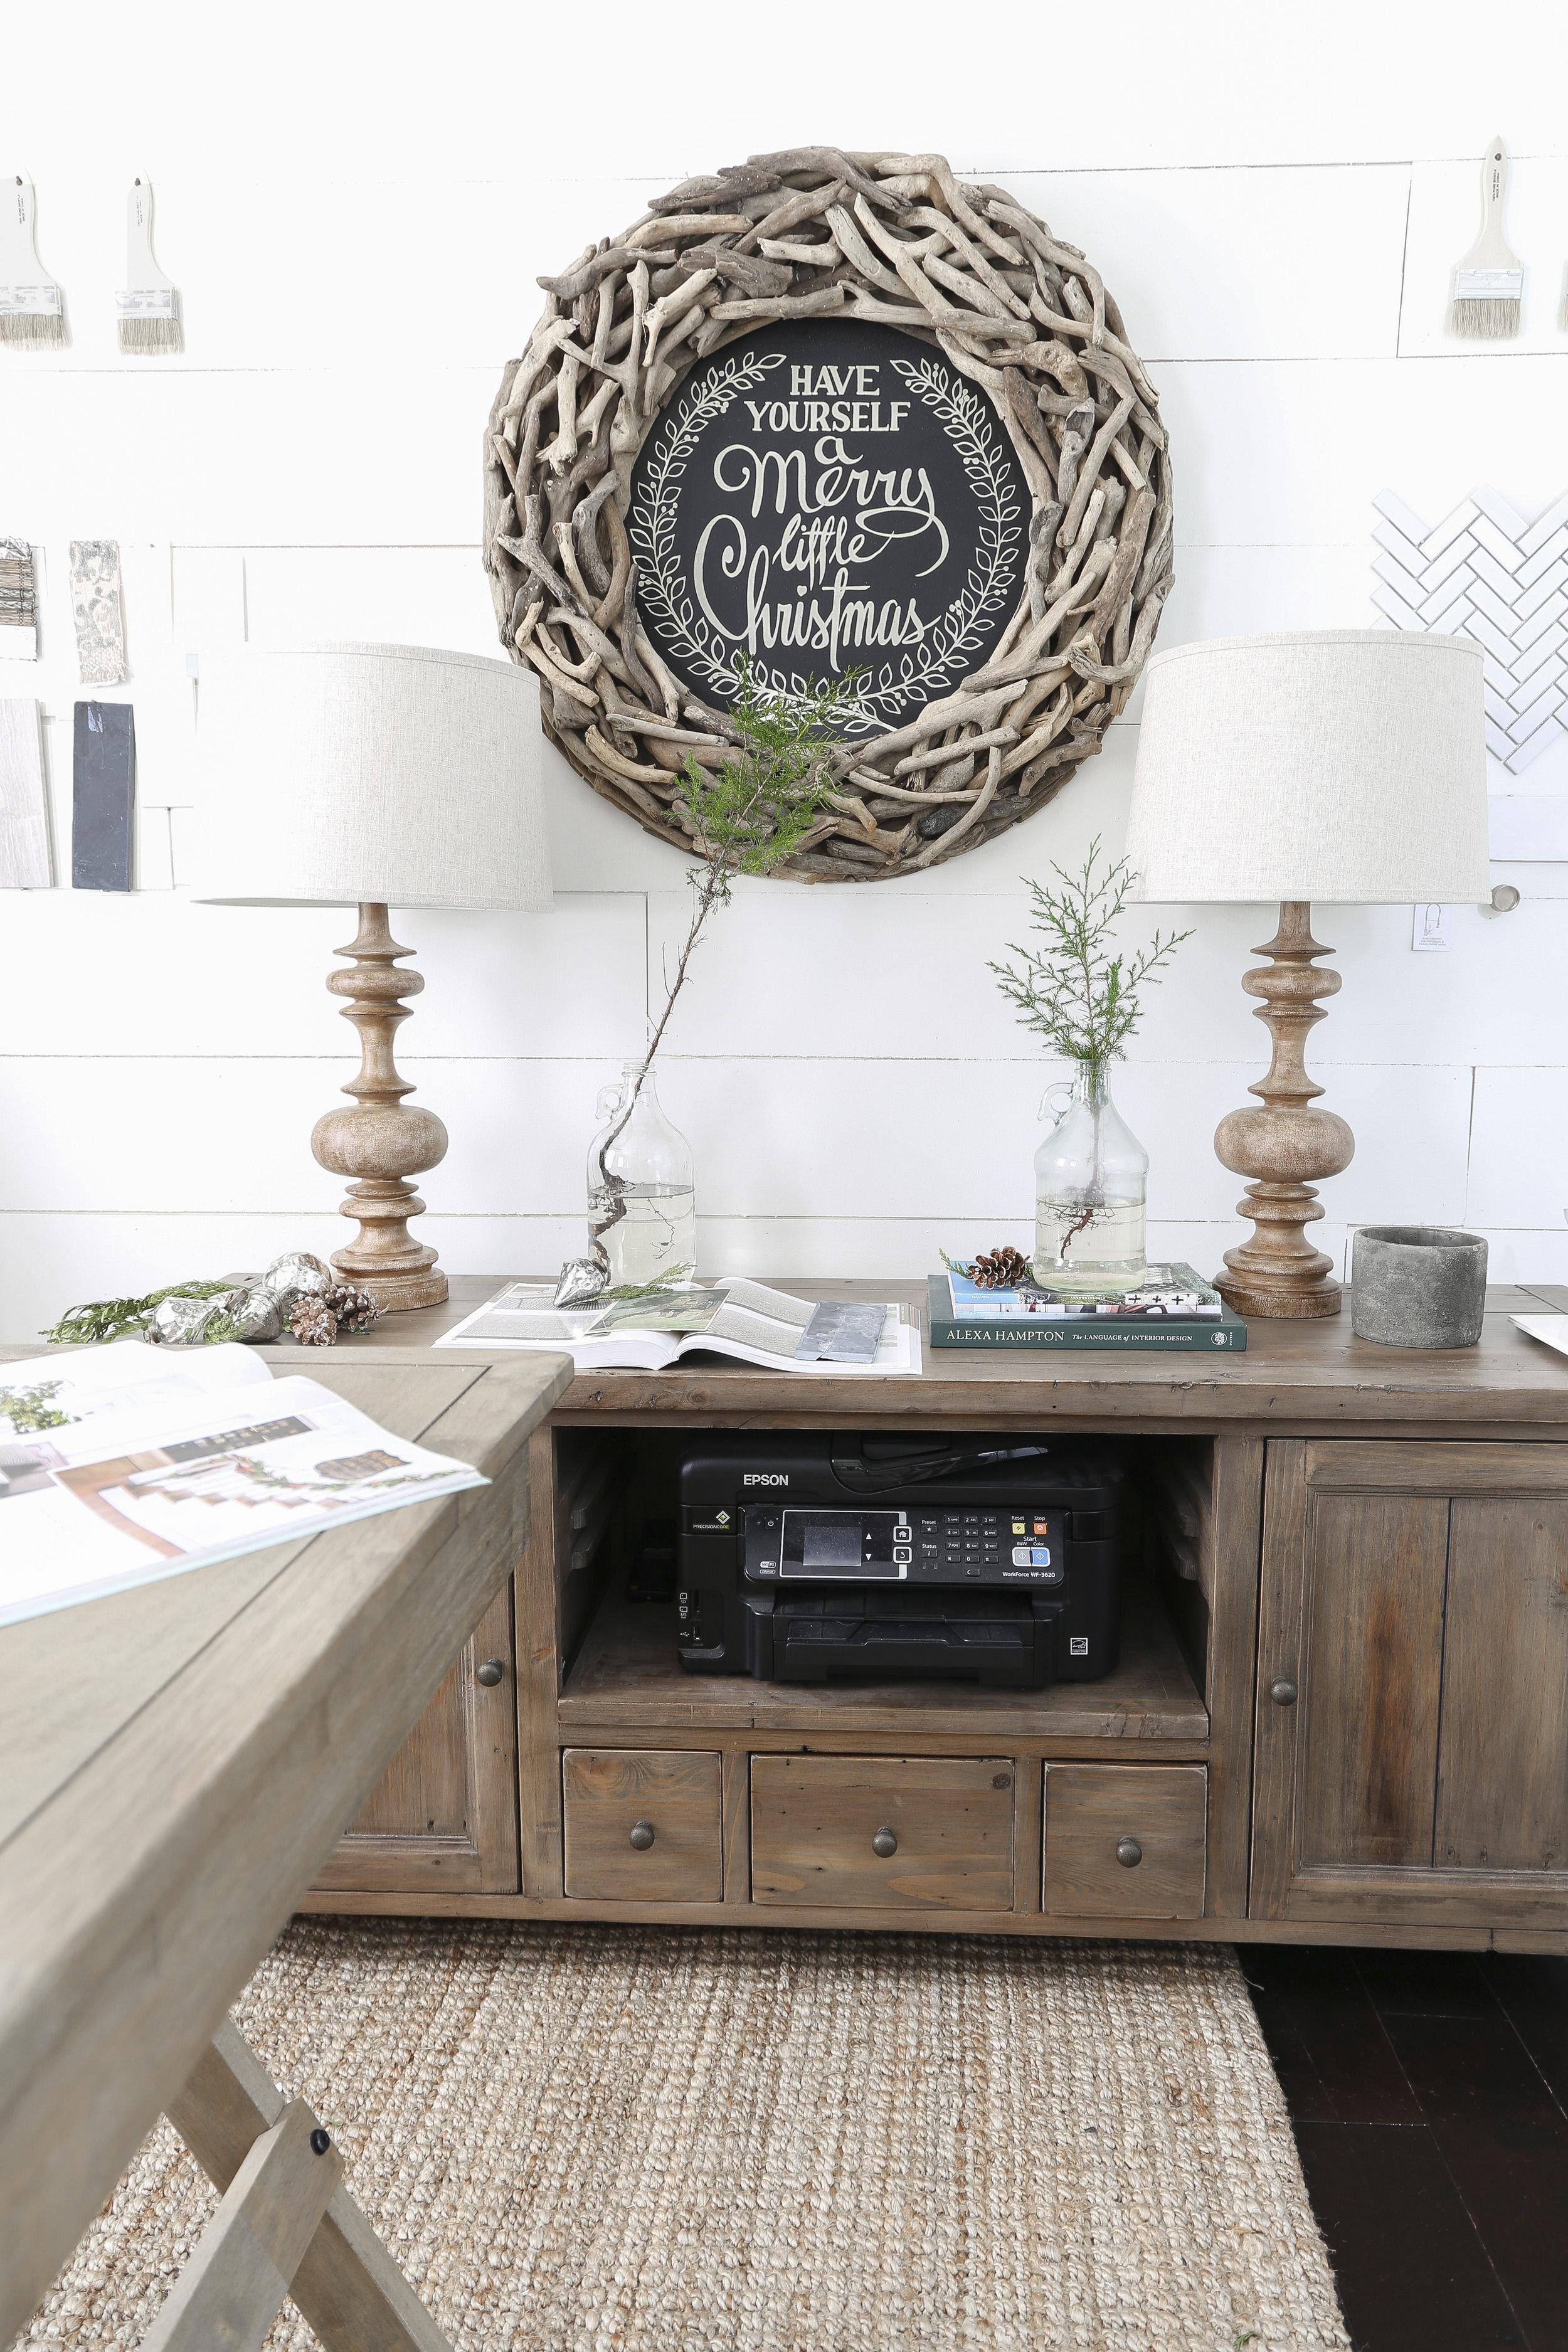 Christmas Home Tour- Holiday Office Decor- Wood Christmas Sign- Plum Pretty Decor & Design